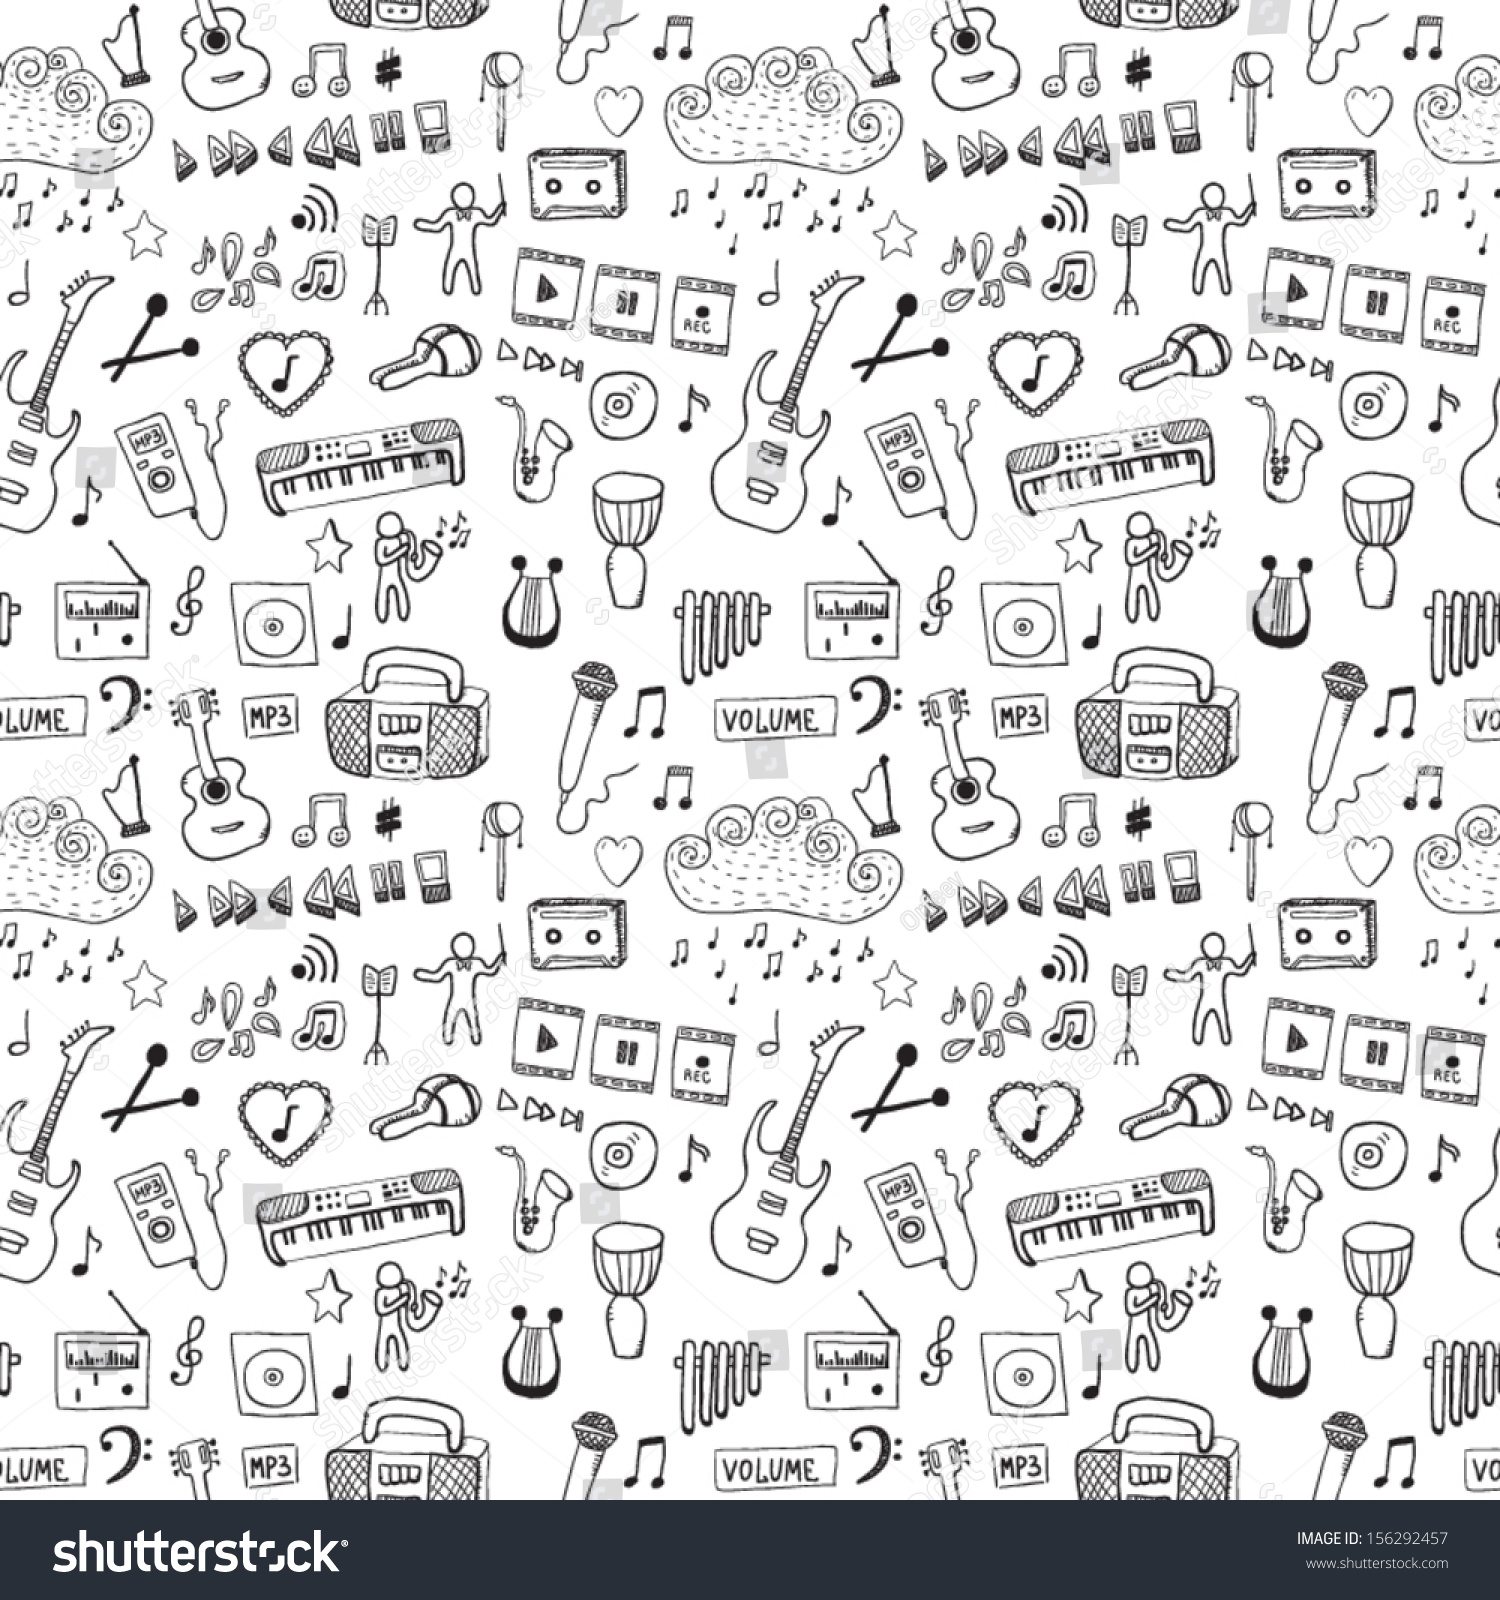 Music symbols seamless pattern stock vector 156292457 shutterstock music symbols seamless pattern buycottarizona Gallery